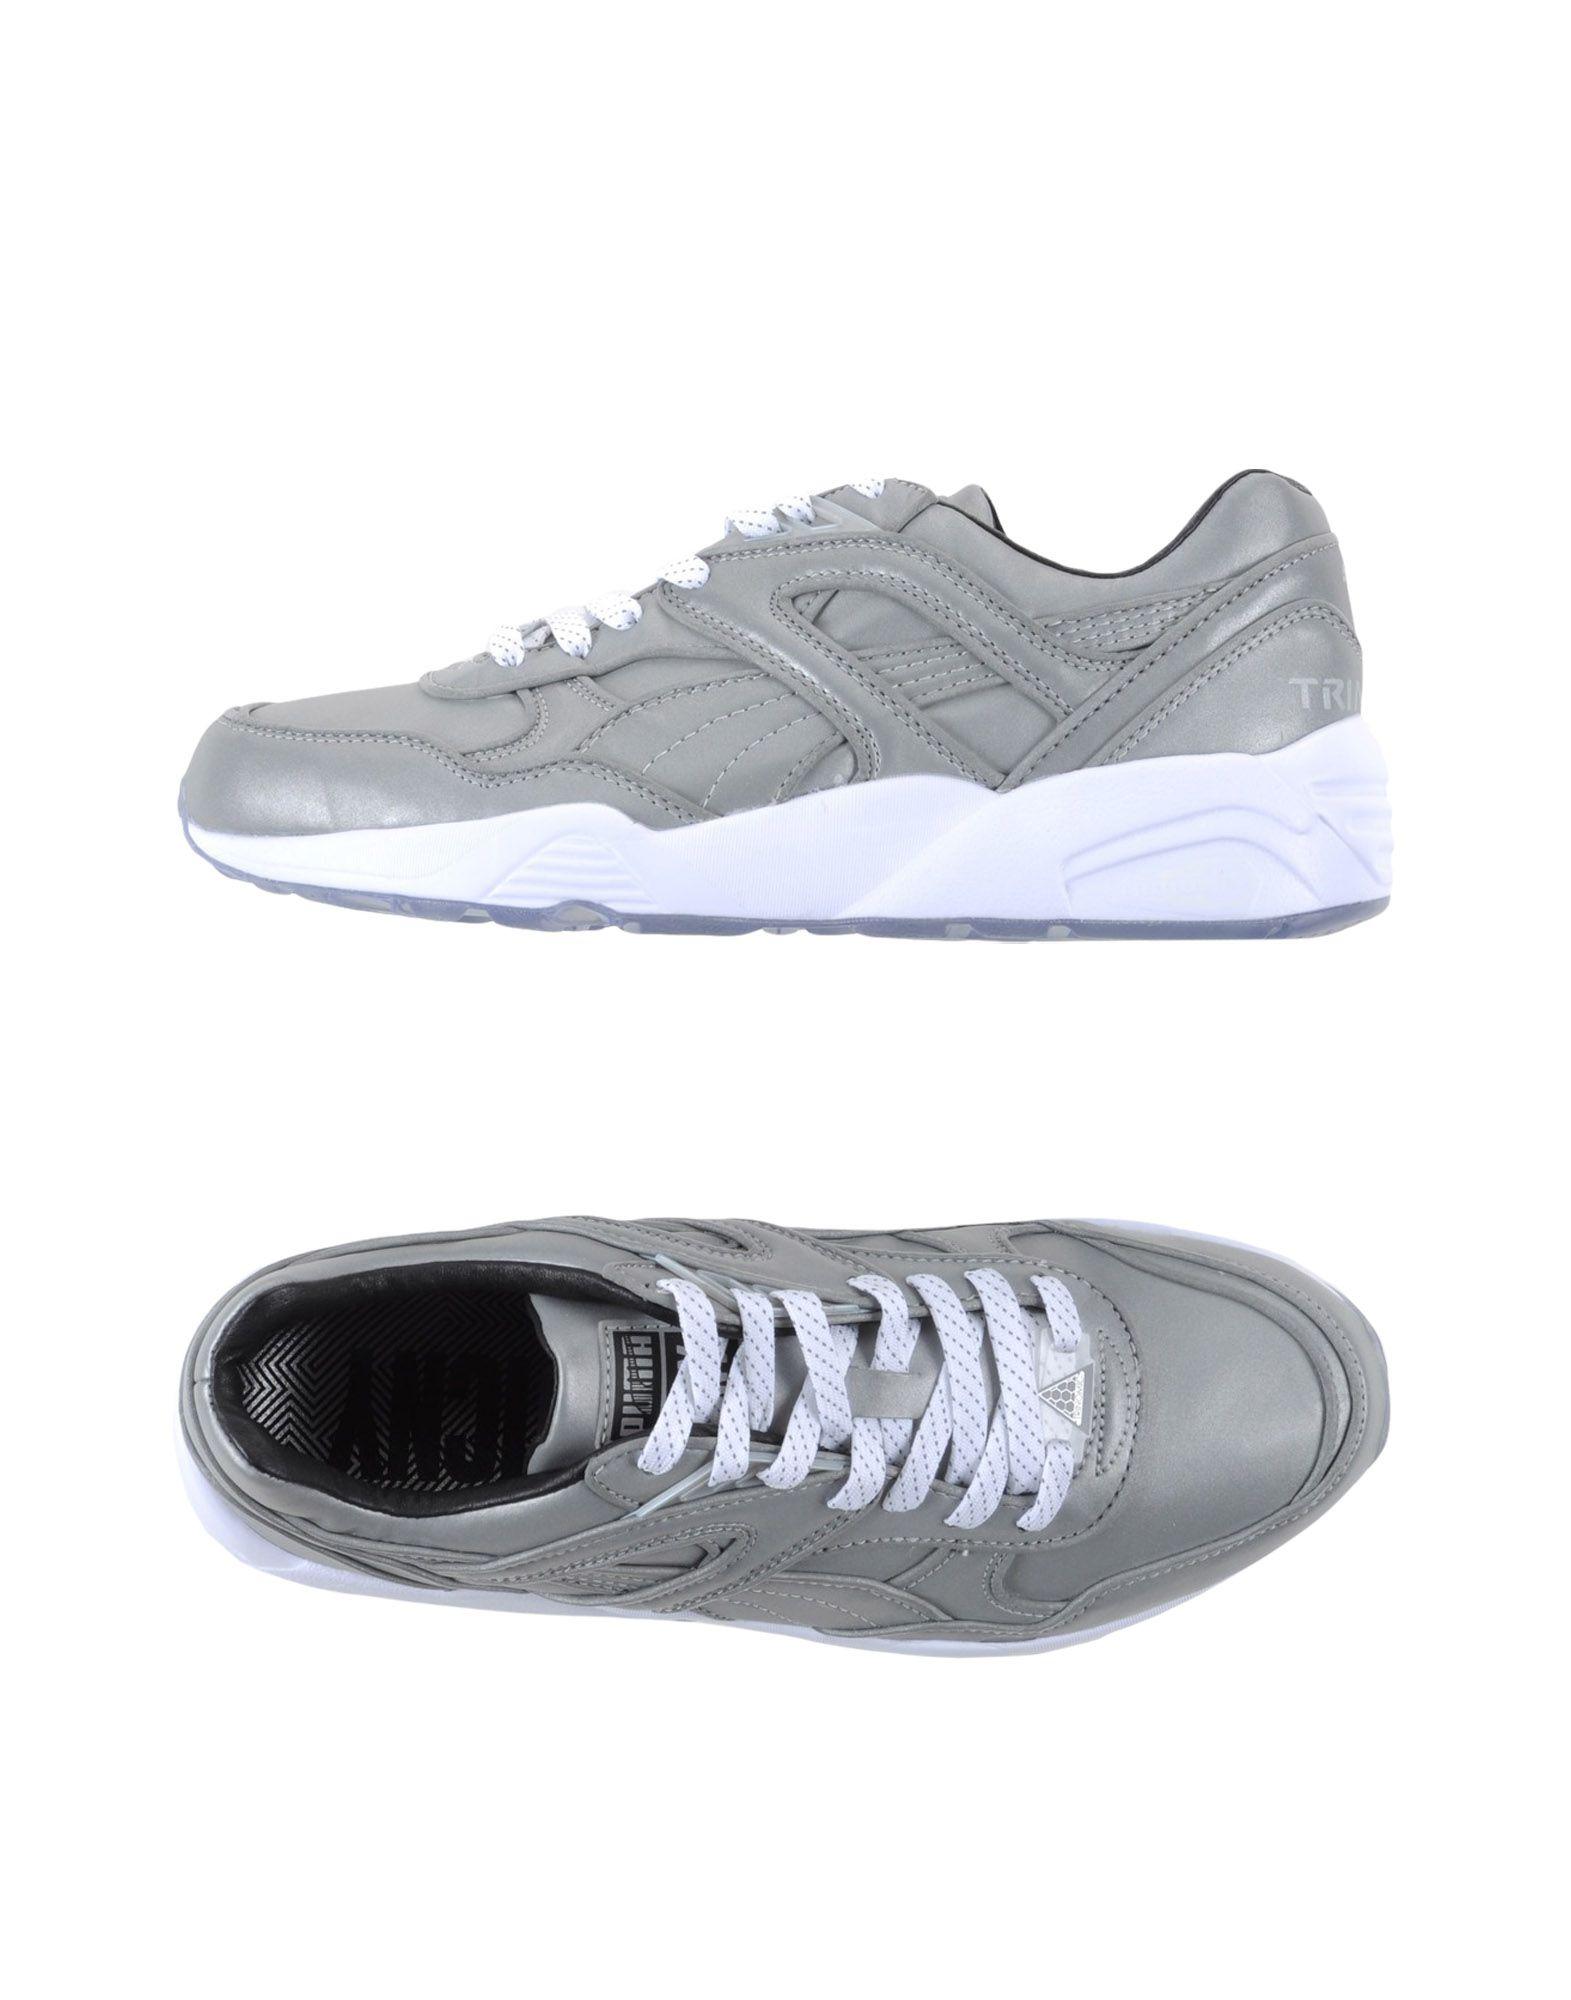 Puma X Icny Sneakers - Men Puma on X Icny Sneakers online on Puma  Canada - 11015030GI 922892